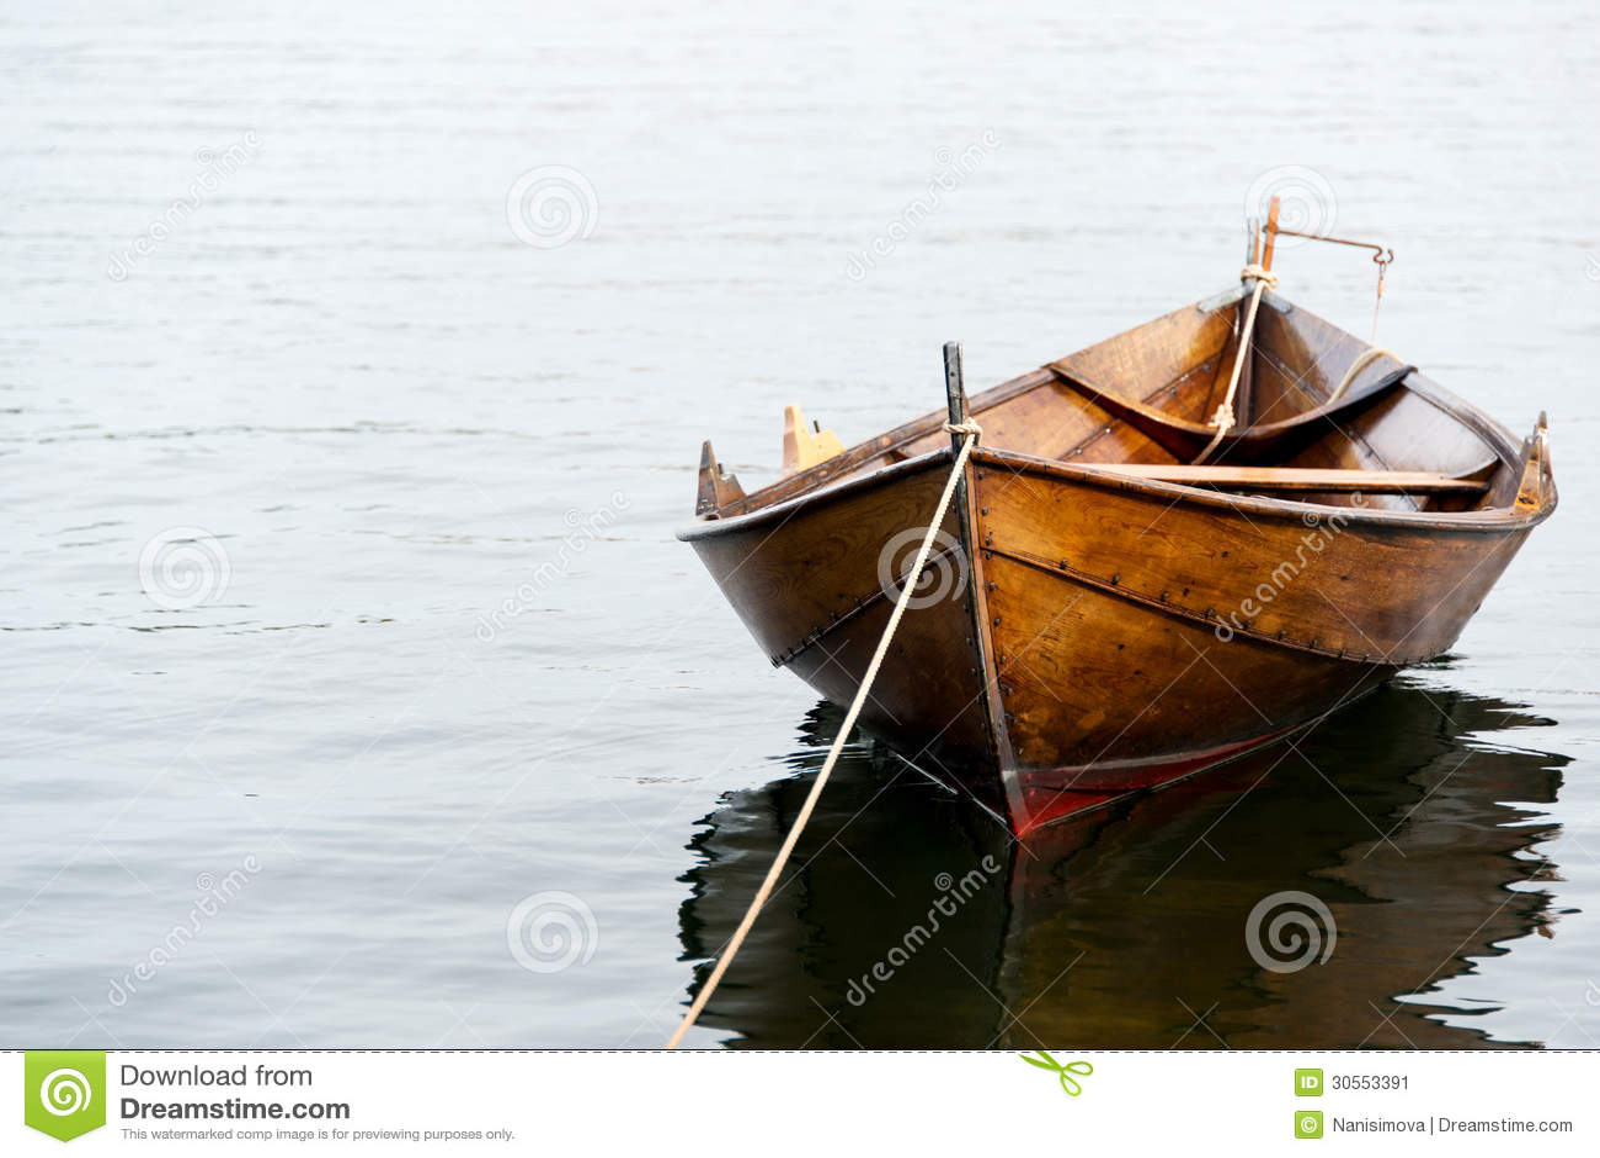 Rowboat In Oslo Stock Image - Image: 30553391